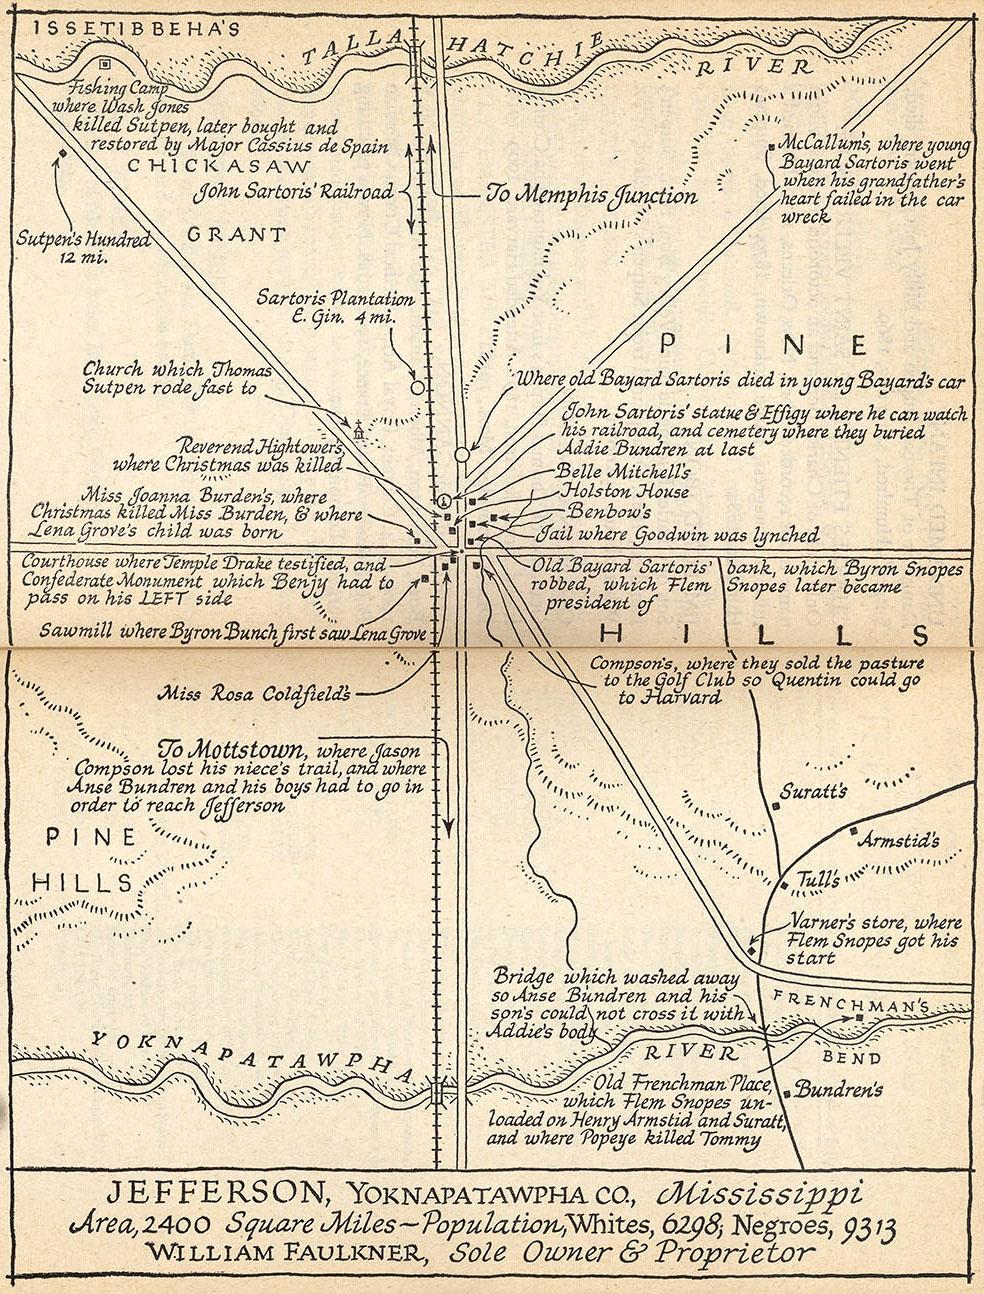 1951 Absalom Map